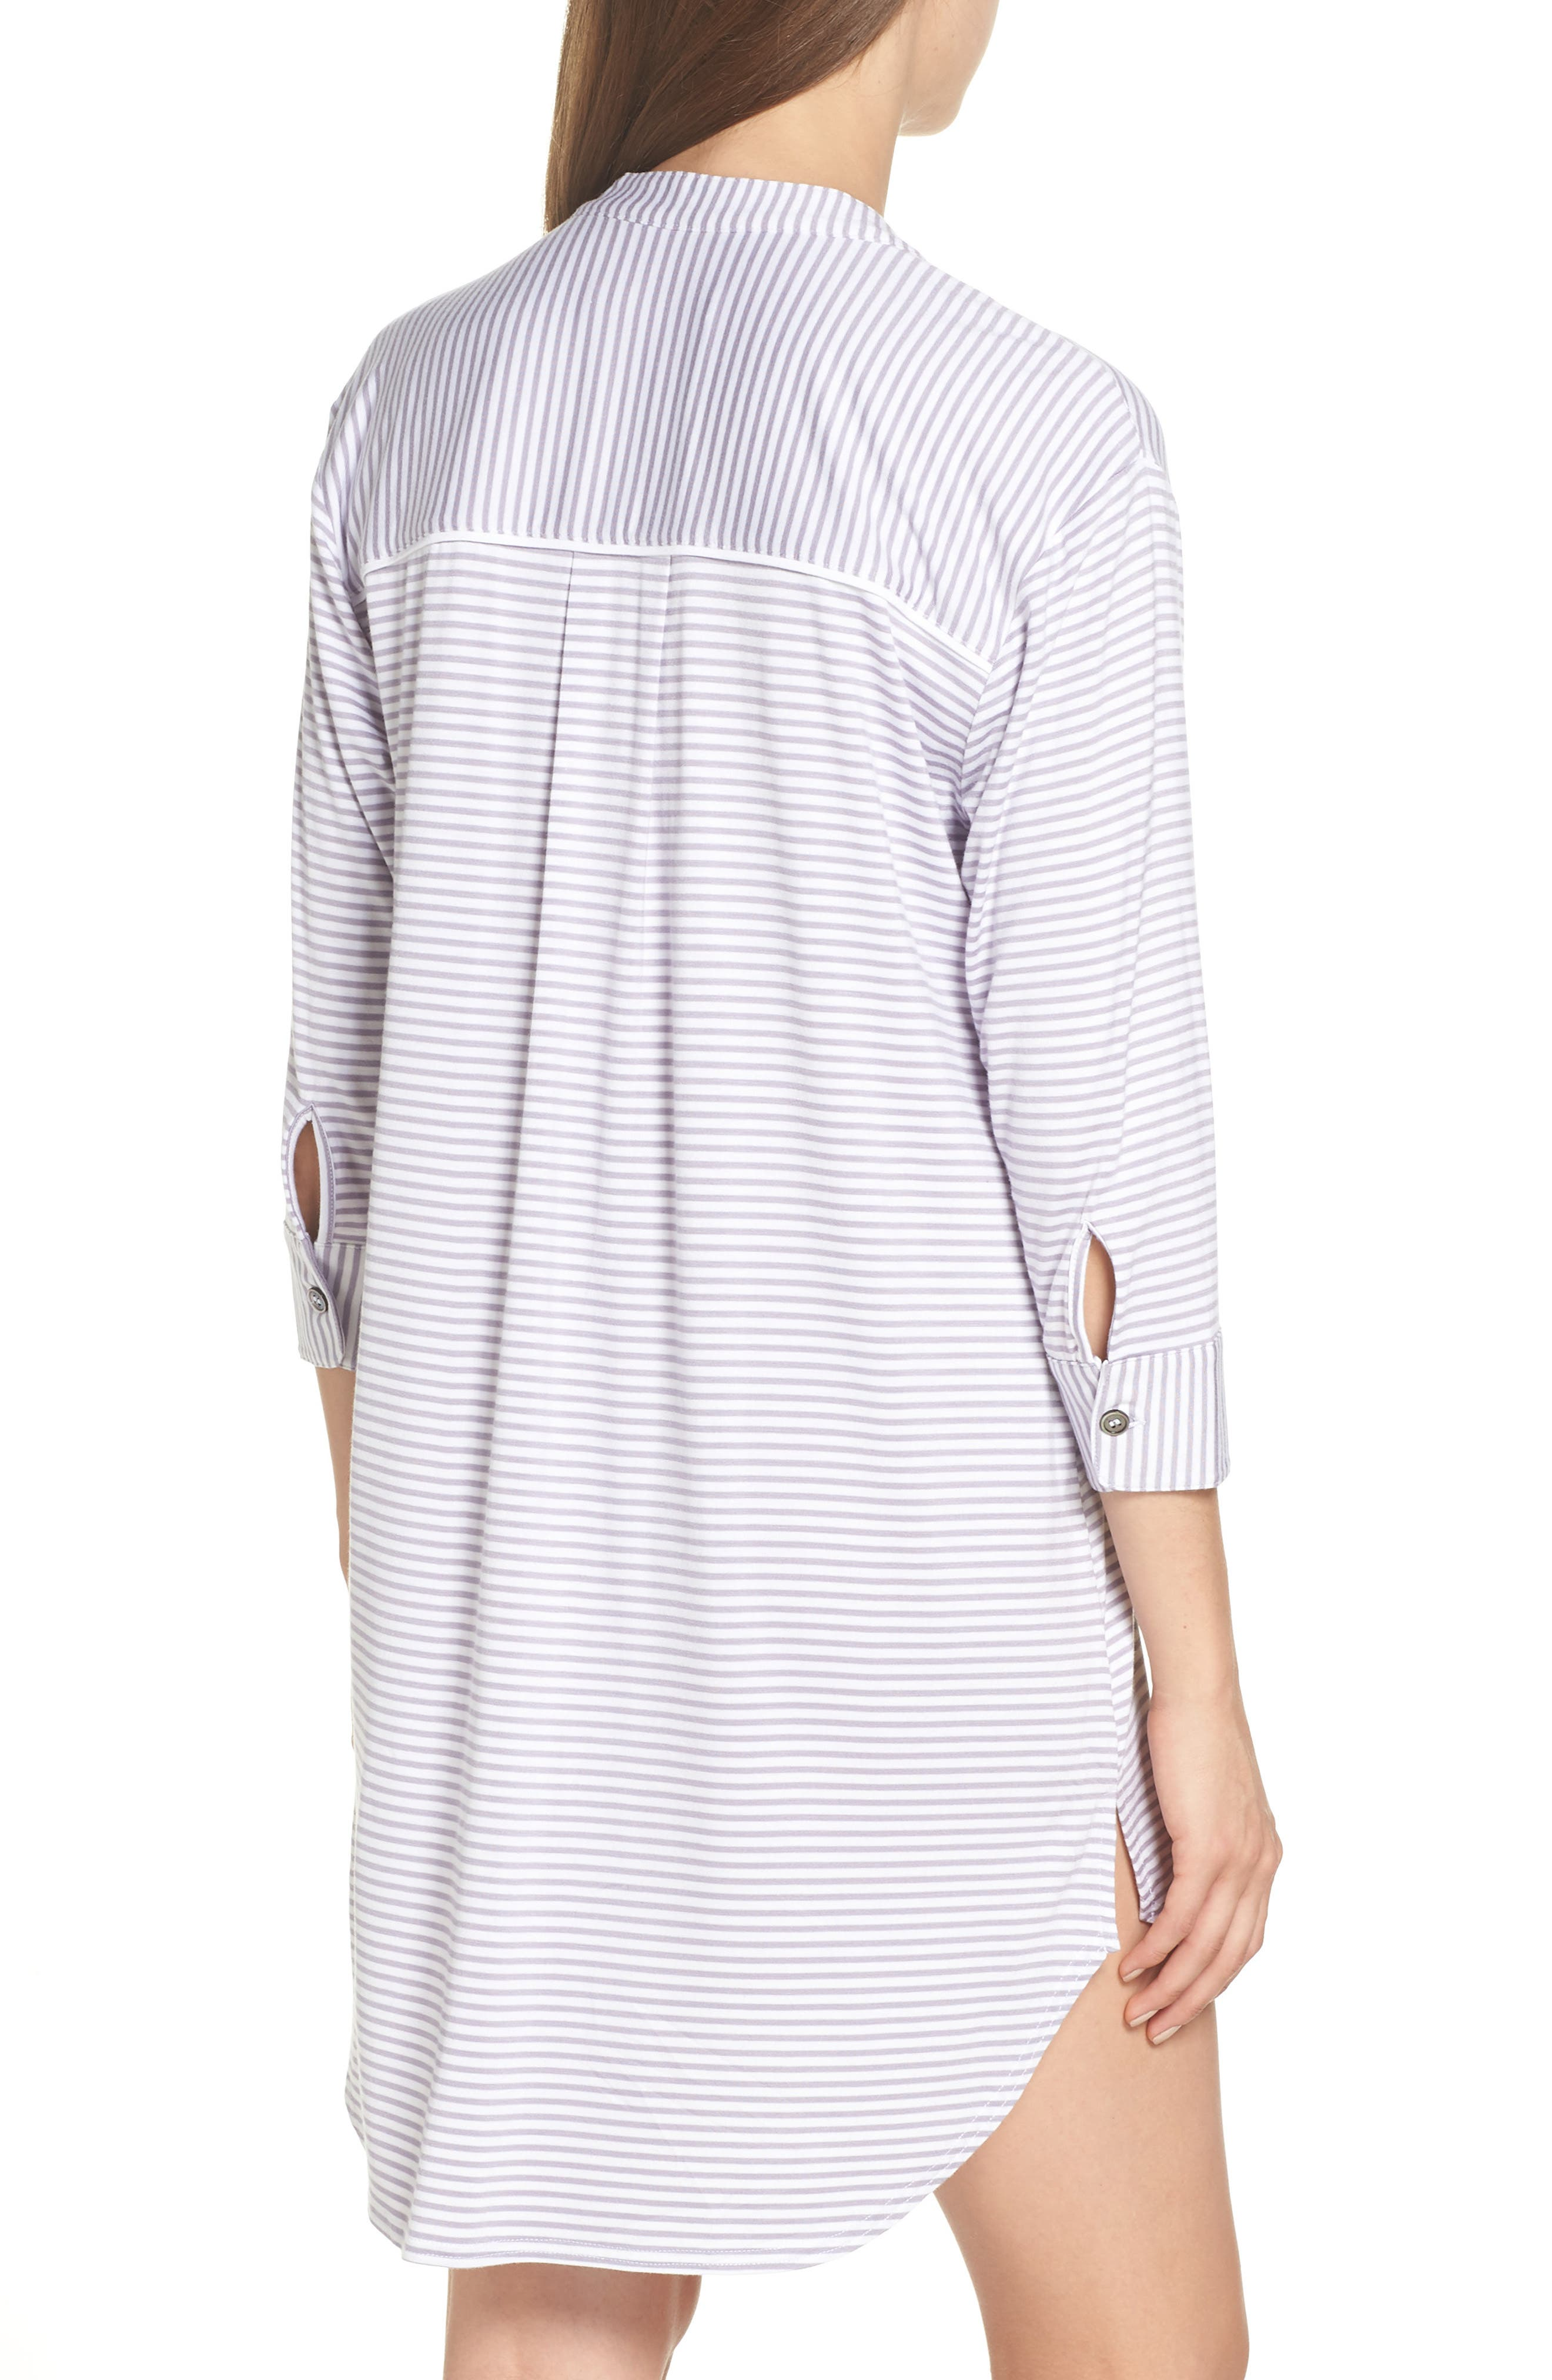 Vivian Sleep Shirt,                             Alternate thumbnail 2, color,                             LAVENDER AURA / WHITE STRIPE